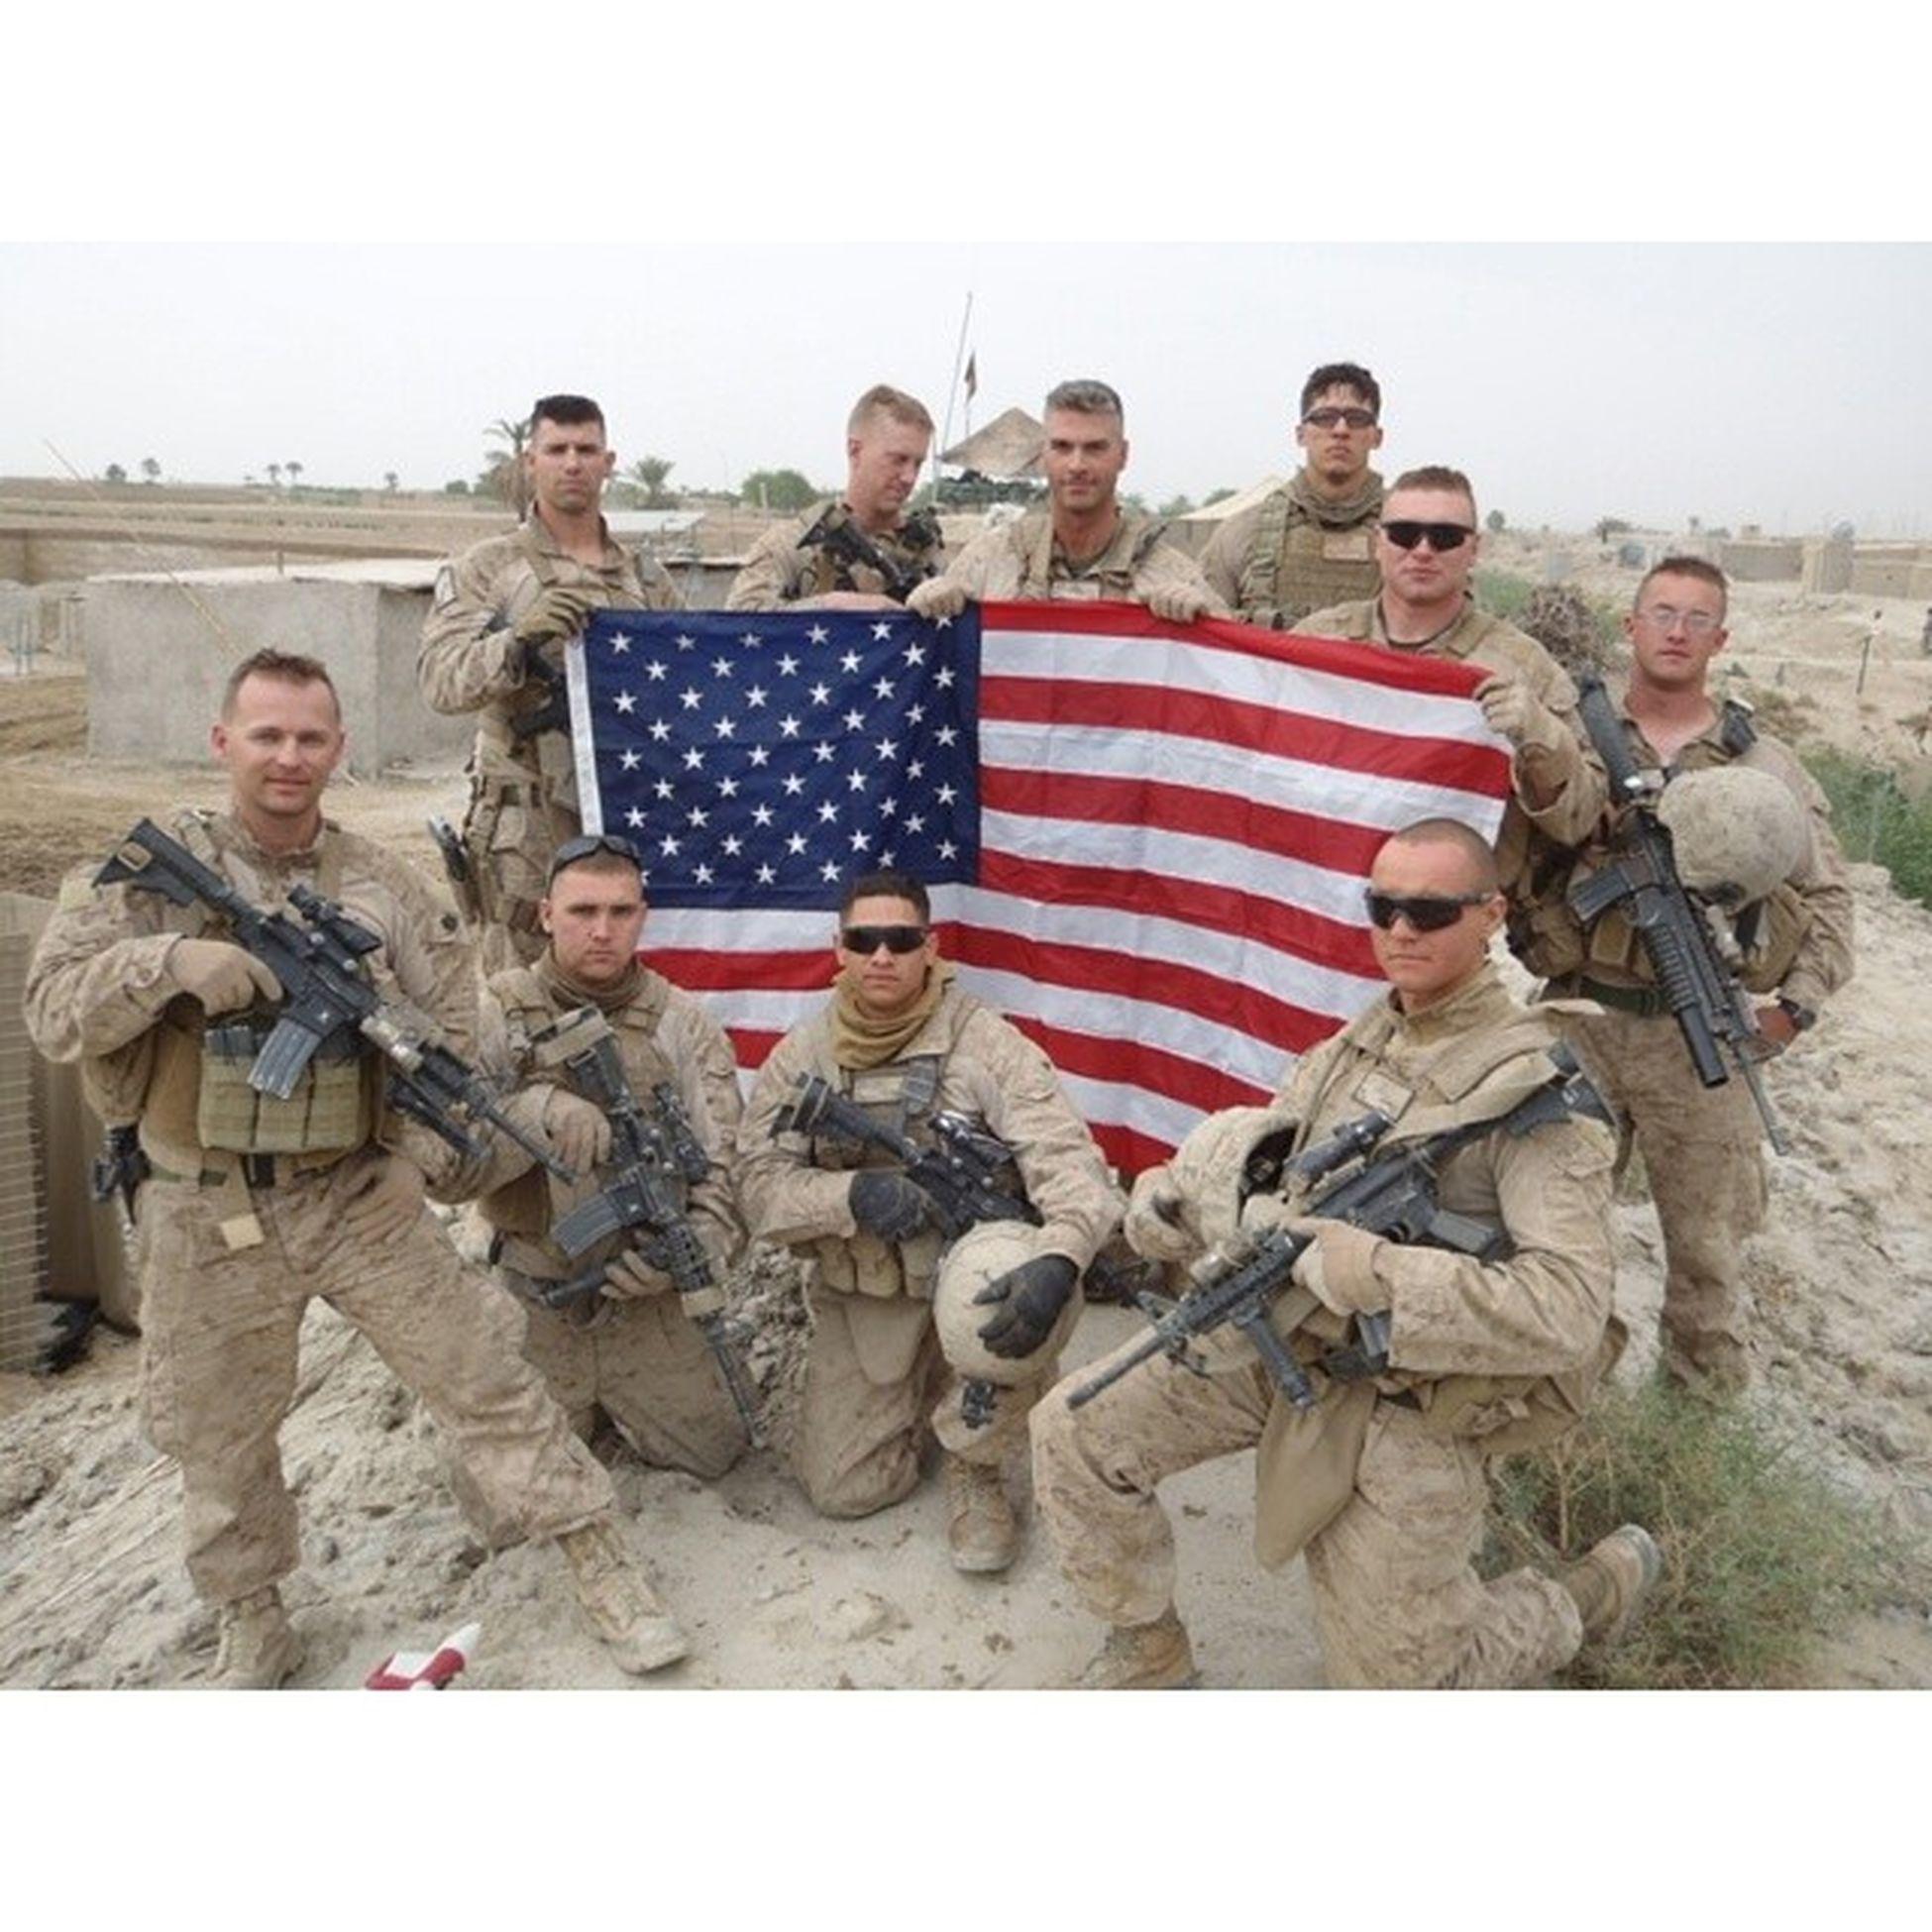 Posting up Merika in Afghanistan Helmand Infantry LashkarGah doc Corpsman FMF 1stMarineDivision downforafight gunfighters Americanflag ftw feelingpatriotic USMC Navy M4carbine